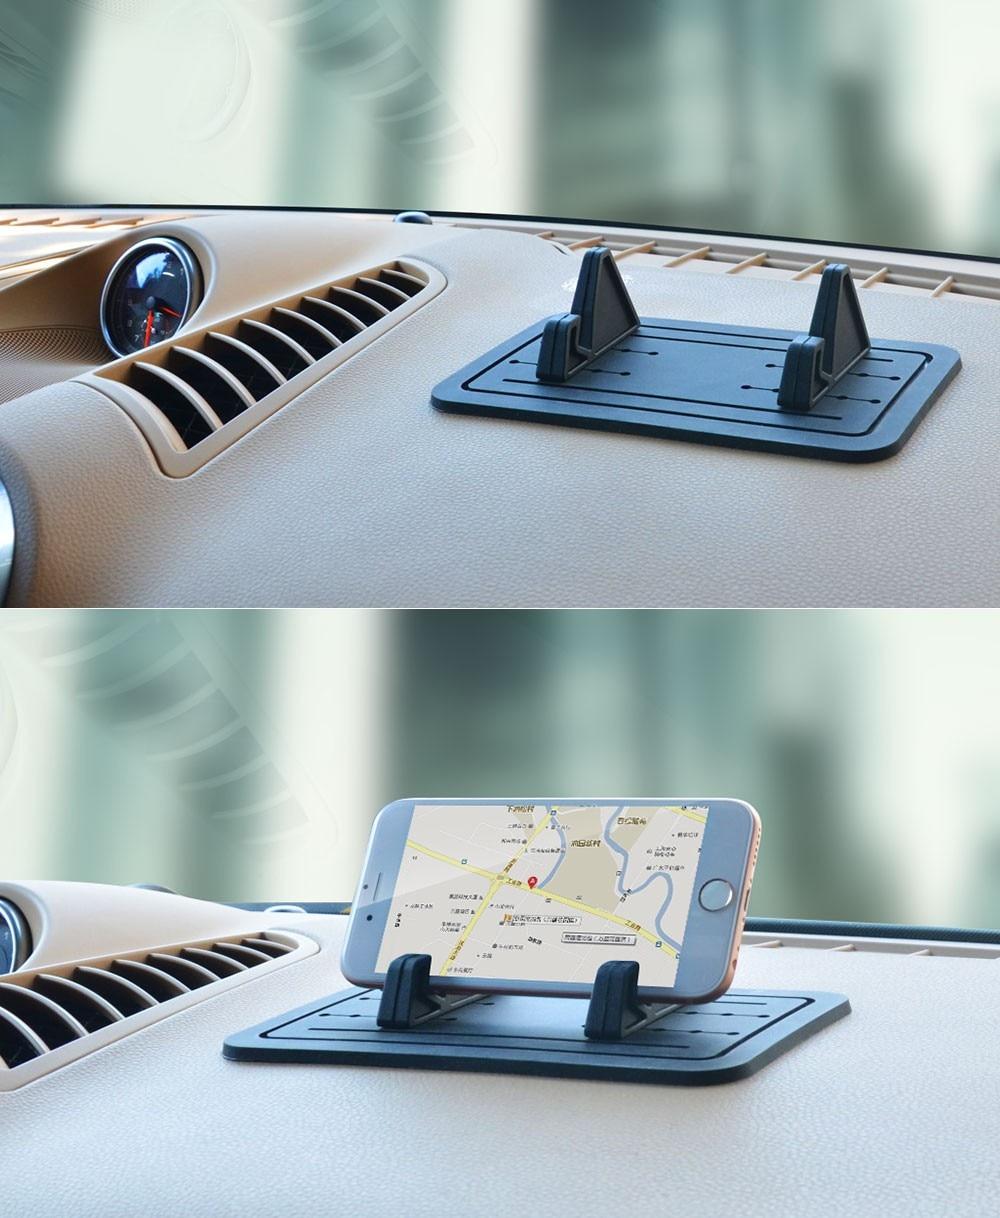 cobao 2016 המכונית החדשה כלי השולחן רכב נייד מחצלת סיליקה ג ' ל הוא למנוע להתחמם נייד phonei כללי על iPhone6s/xiaomi